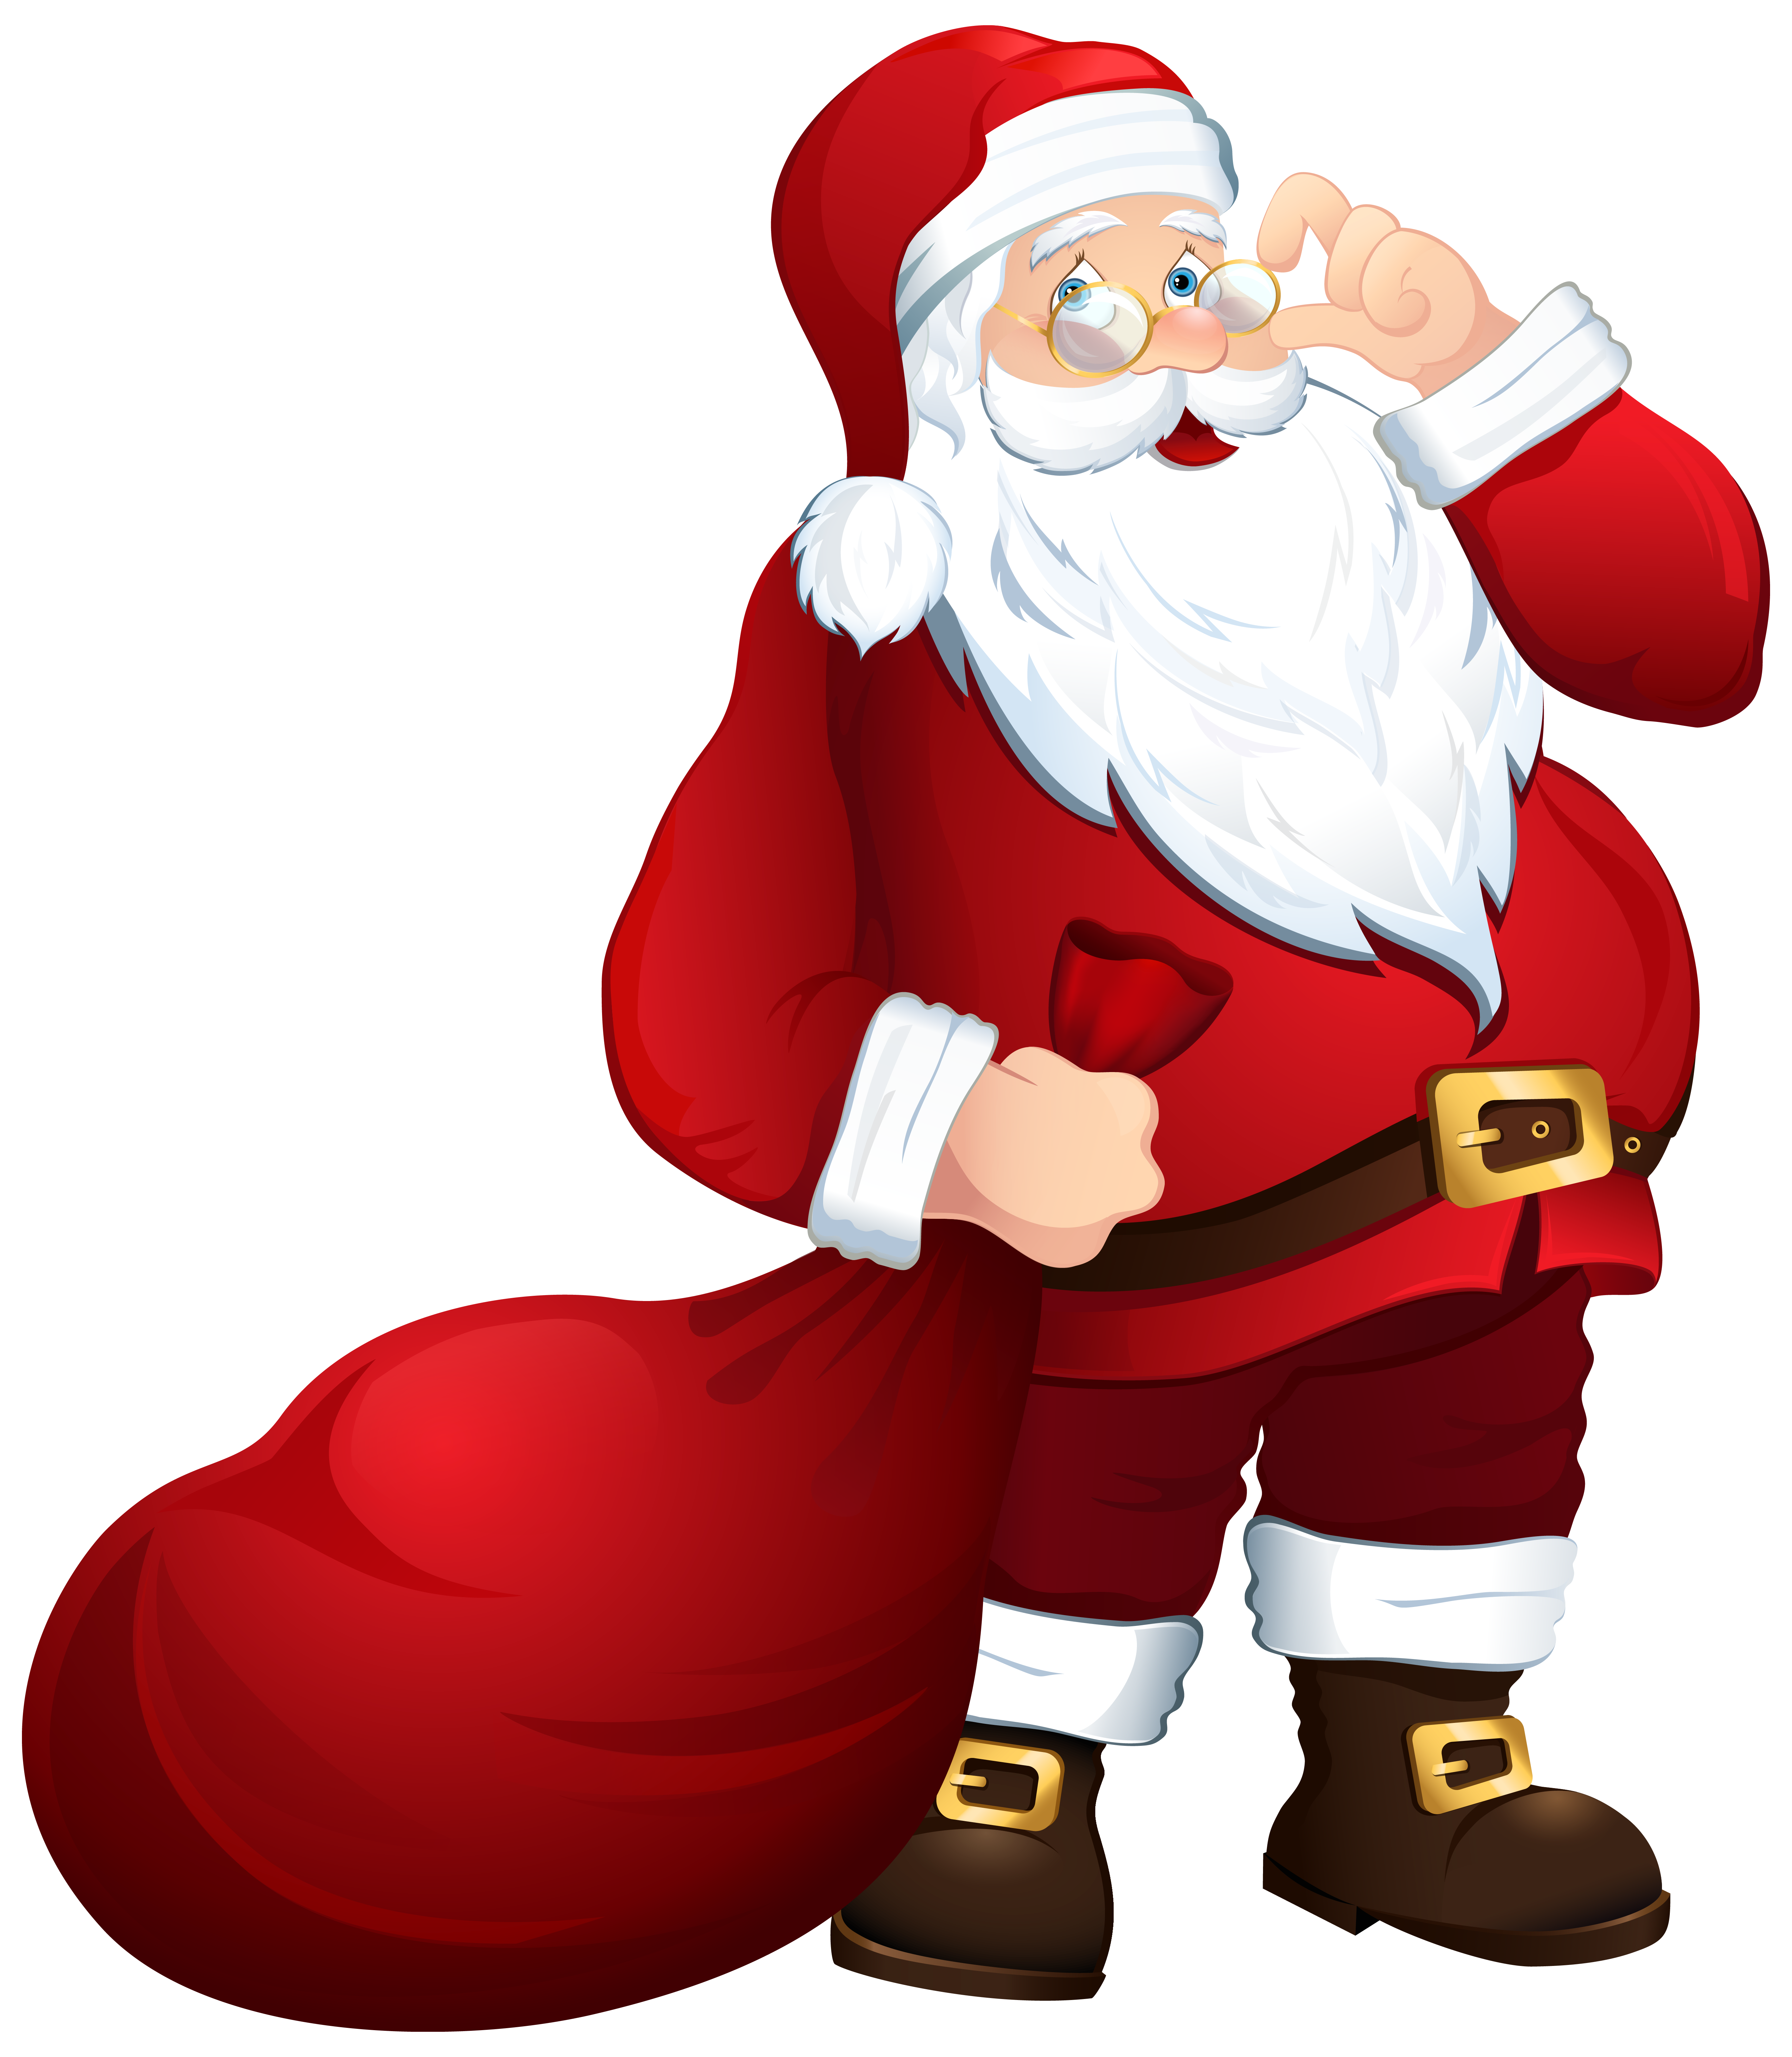 Santa clipart sleeping. Claus with bag png